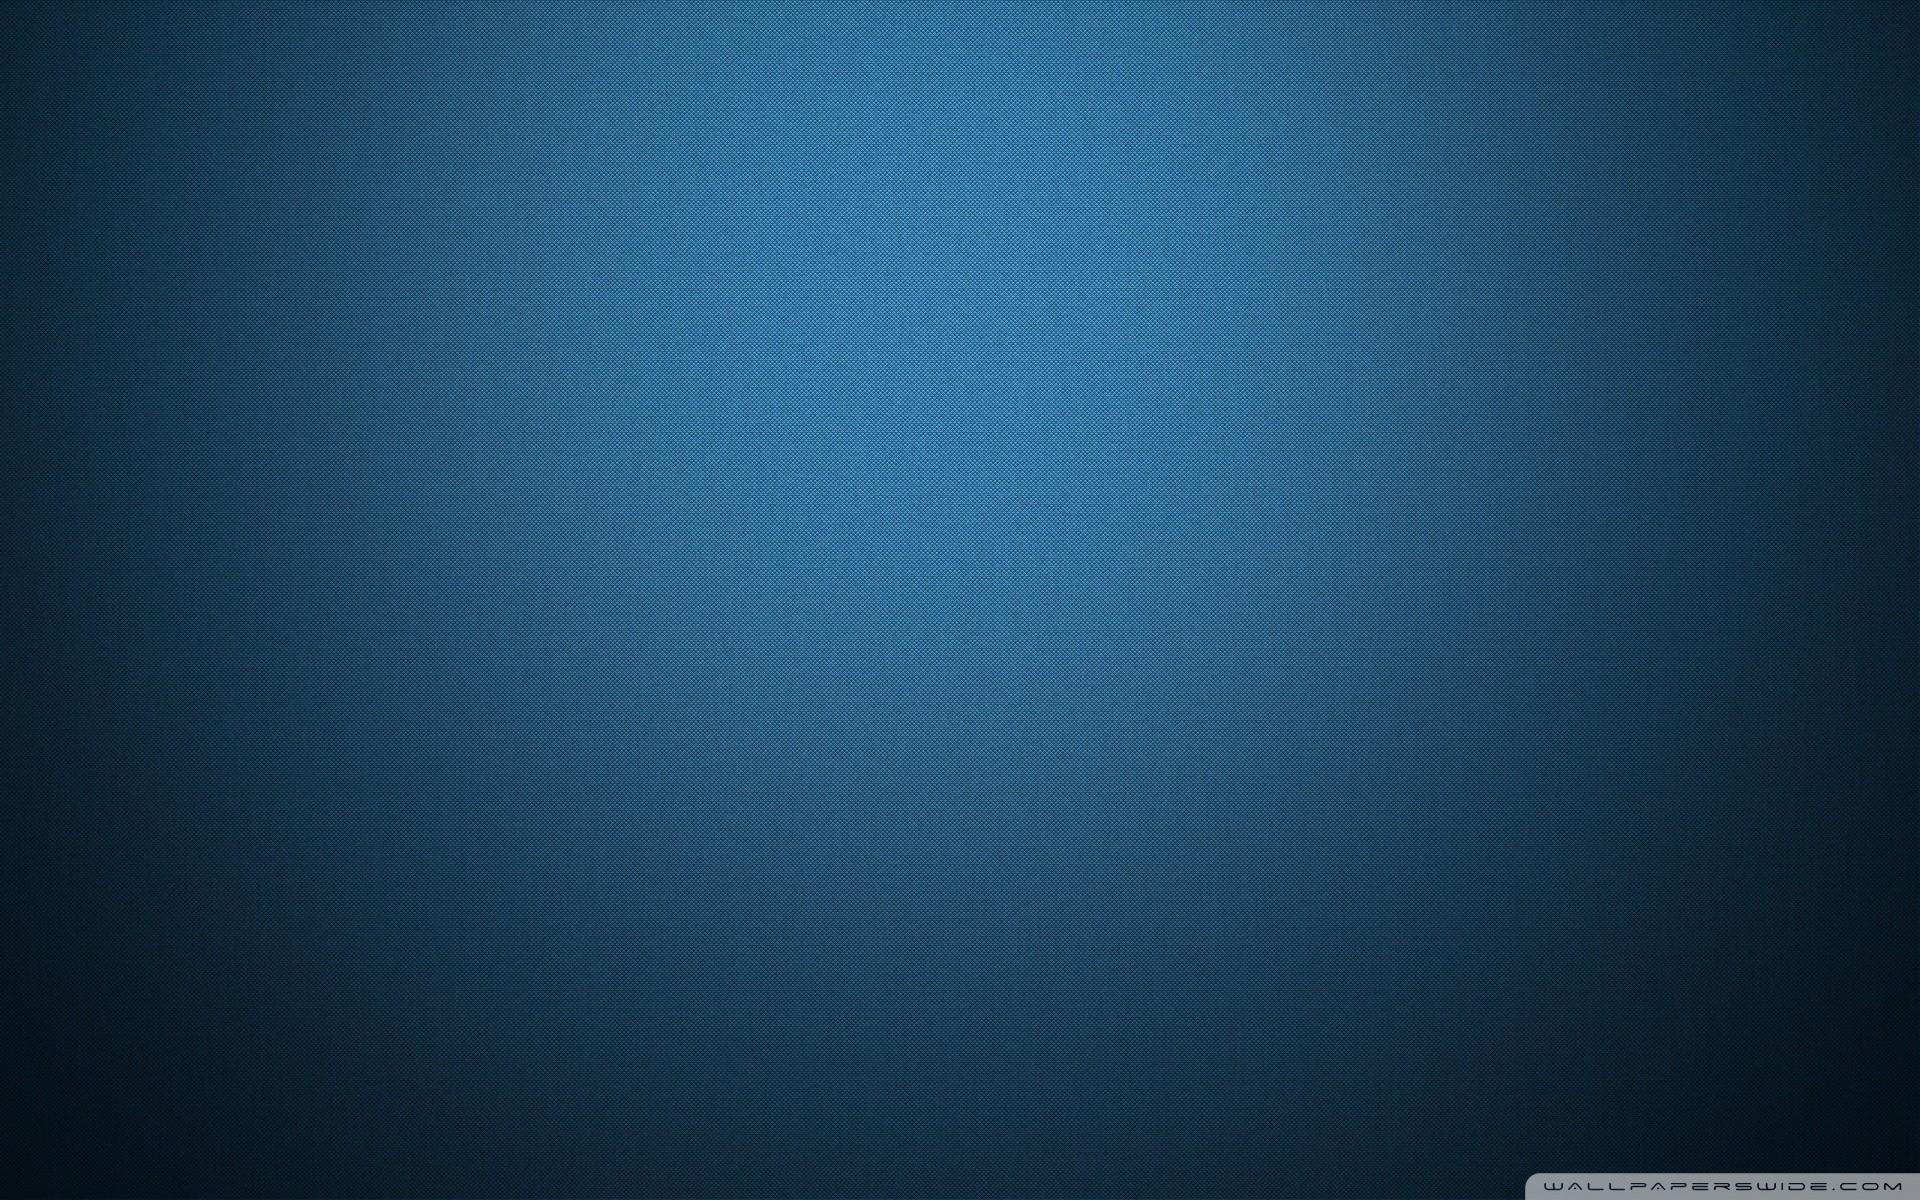 dark blue background wallpaper  u00b7 u2460 wallpapertag